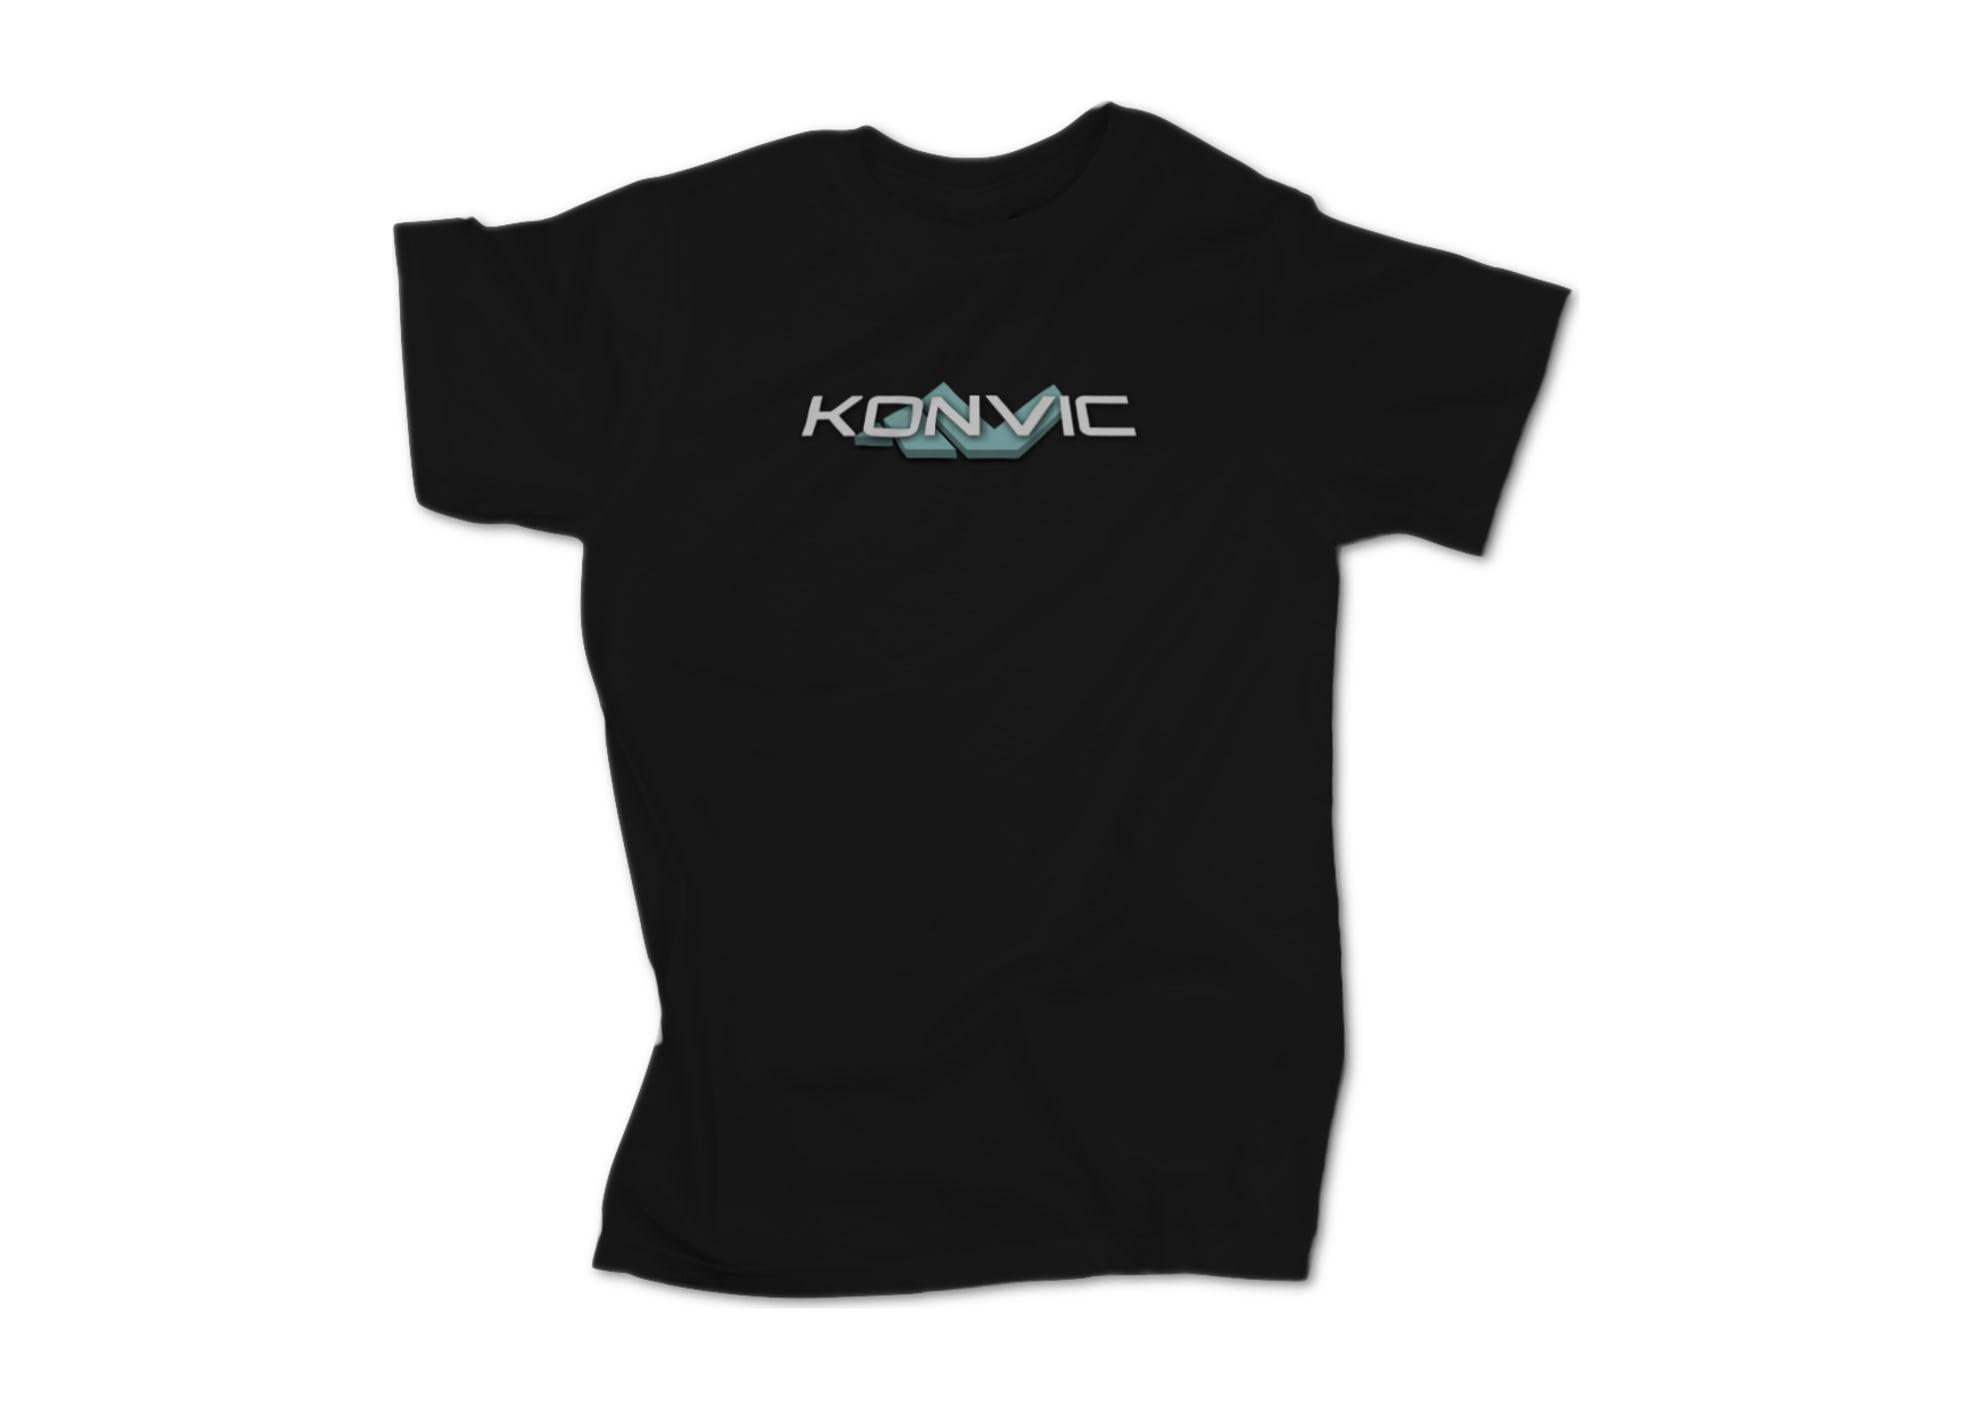 Deepdowndirty record label konvic classic 1523569416